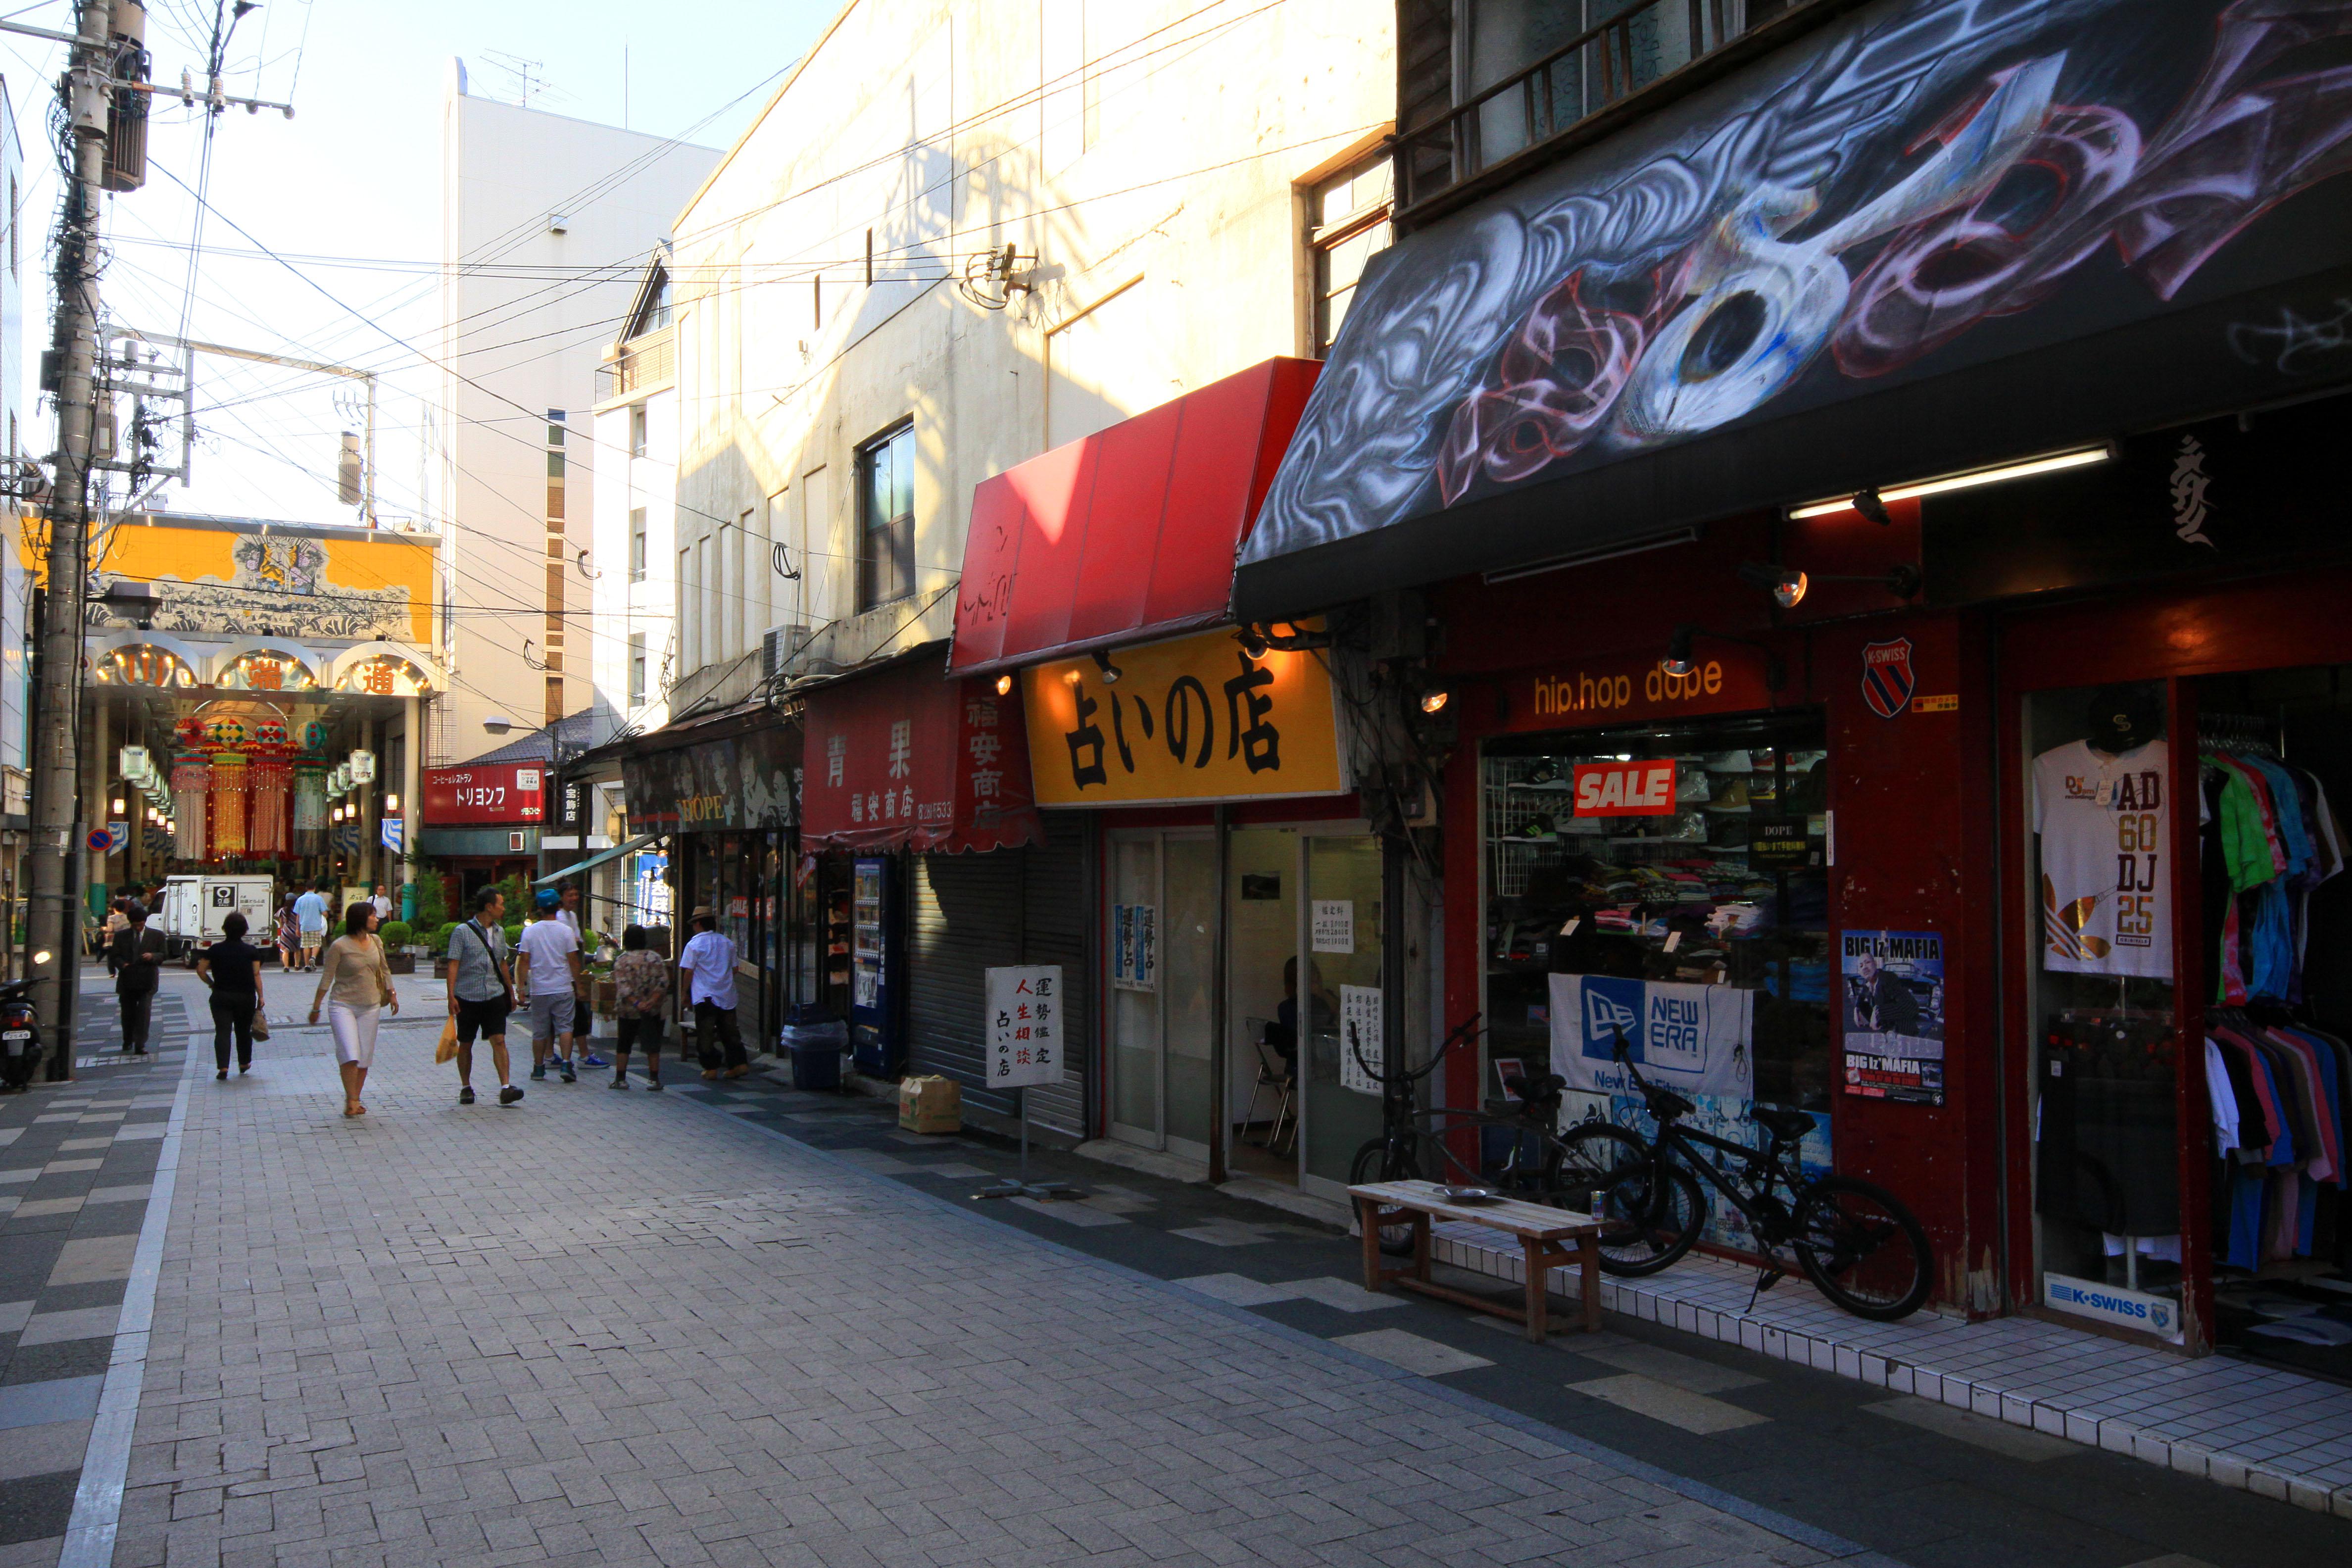 川端地区(2009)の画像